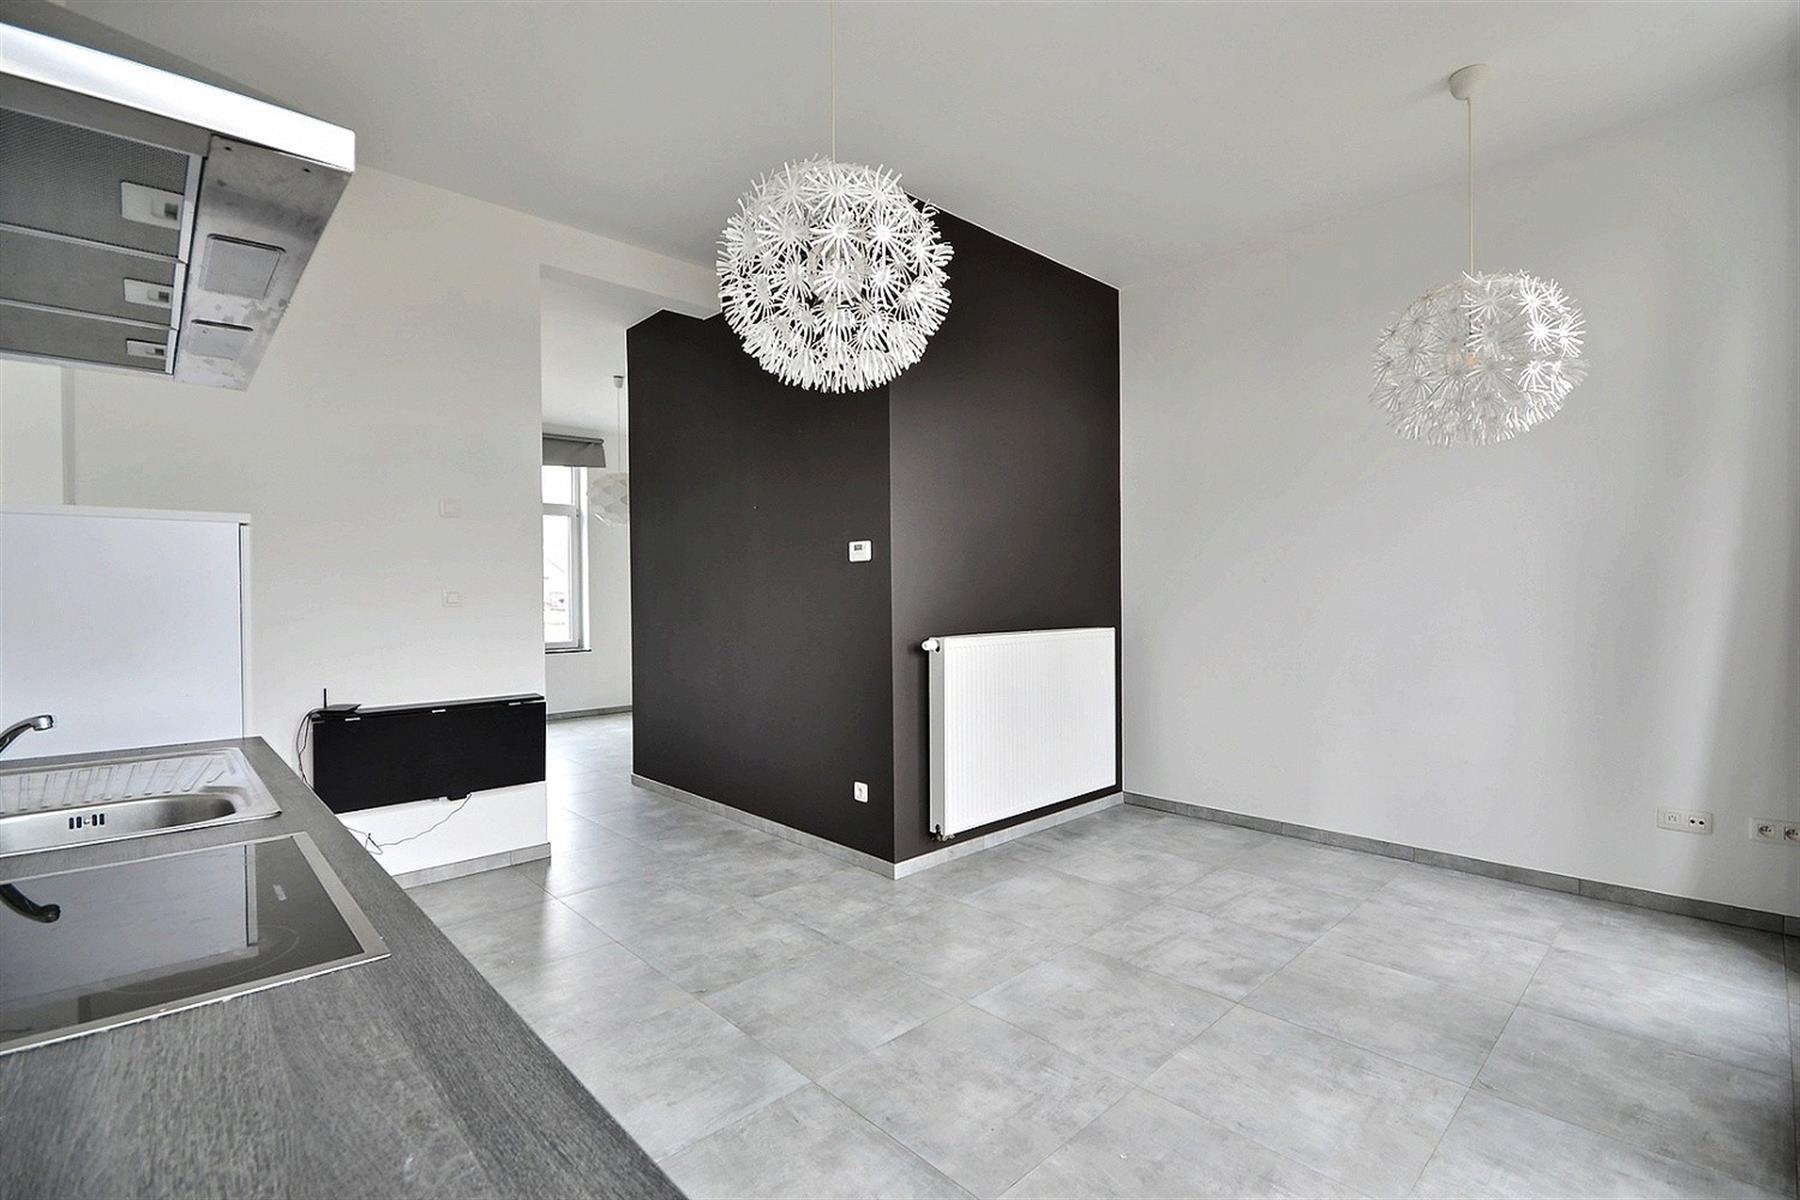 Appartement - LIÈGE - #4530417-3